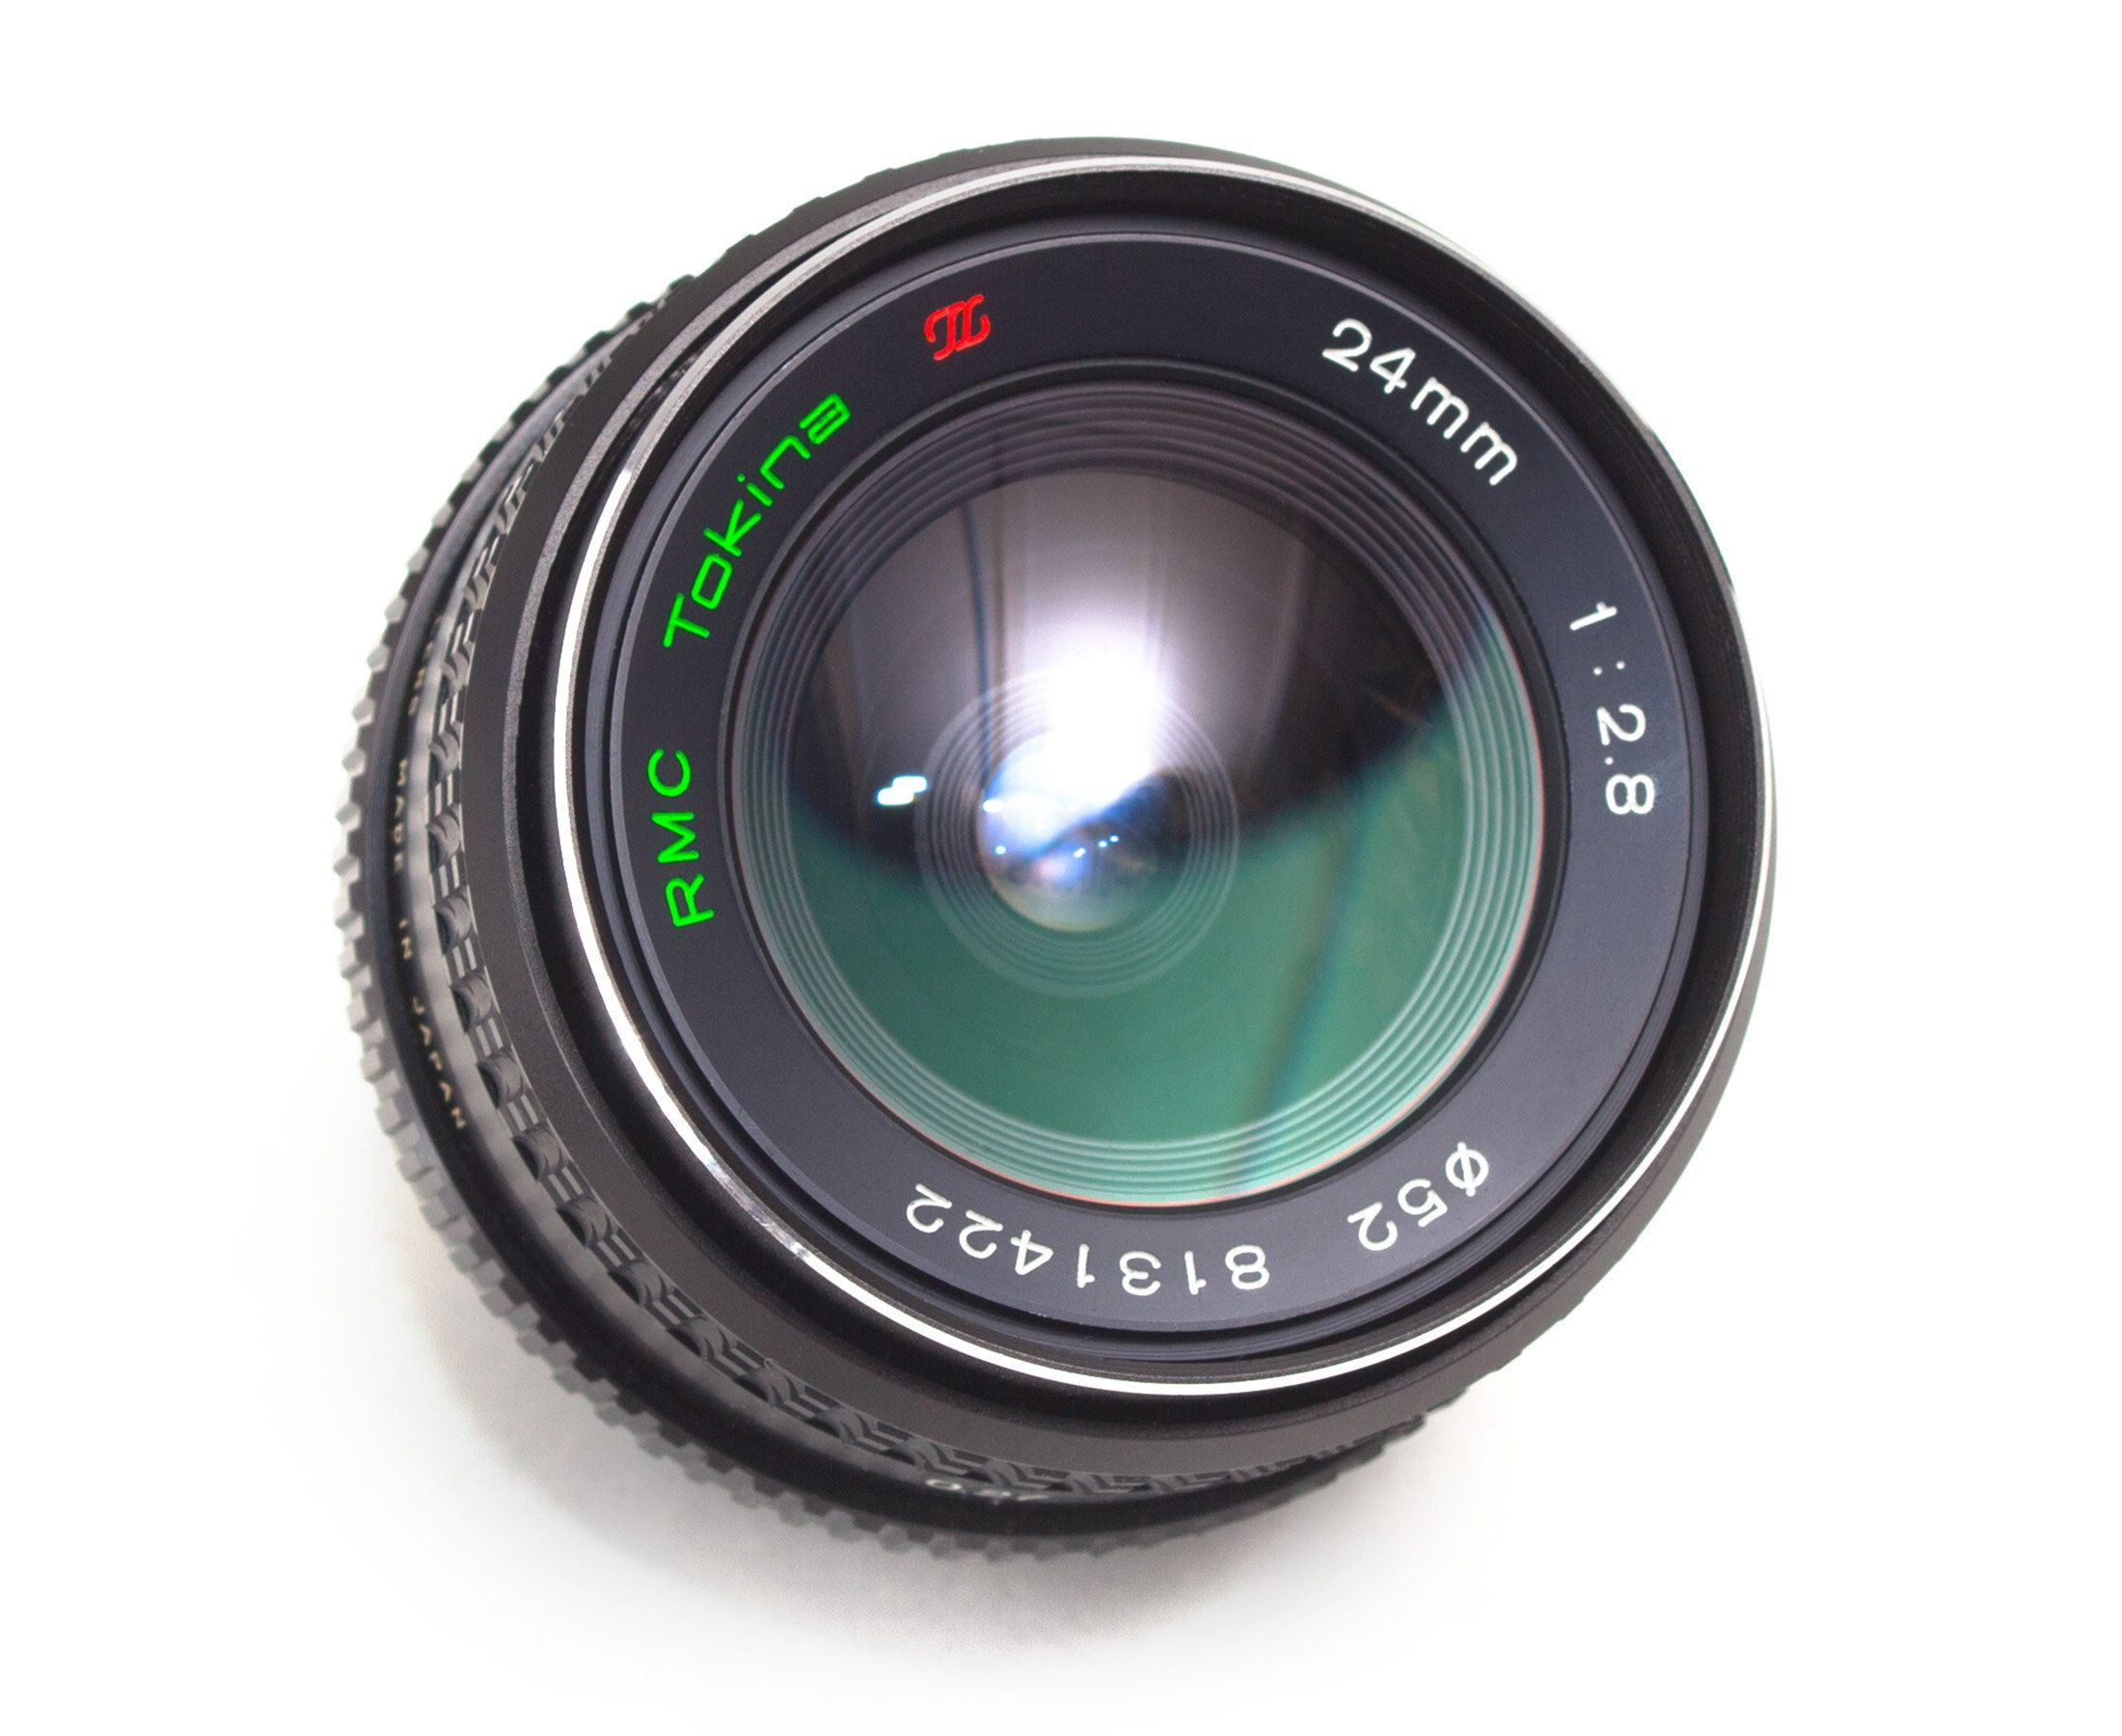 Tokina 24mm F2 8 Rmc Wide Angle Prime Lens Pentax K Pk Fit Etsy Vintage Lenses Wide Angle Prime Lens